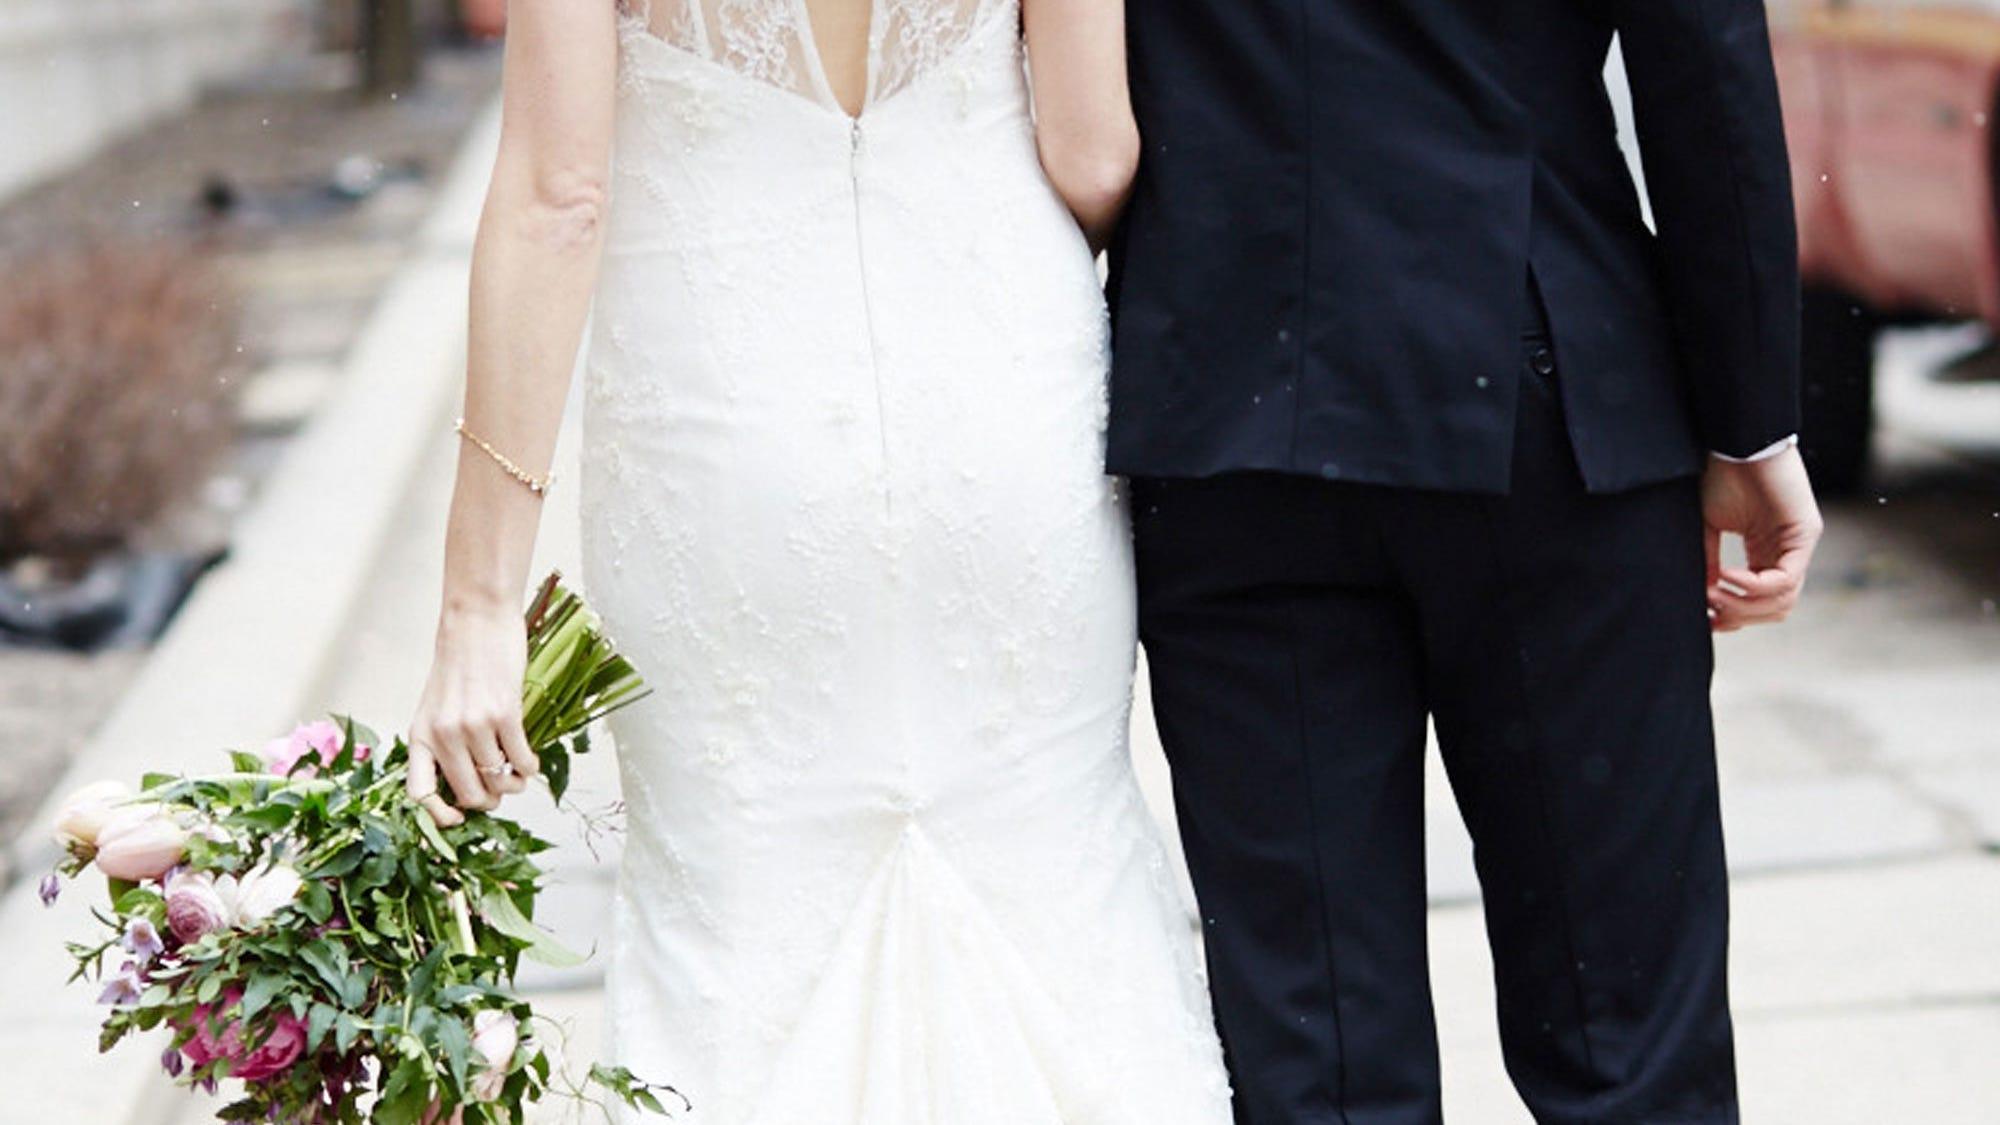 Wedding Cost 2016 Wedding Bud Guide